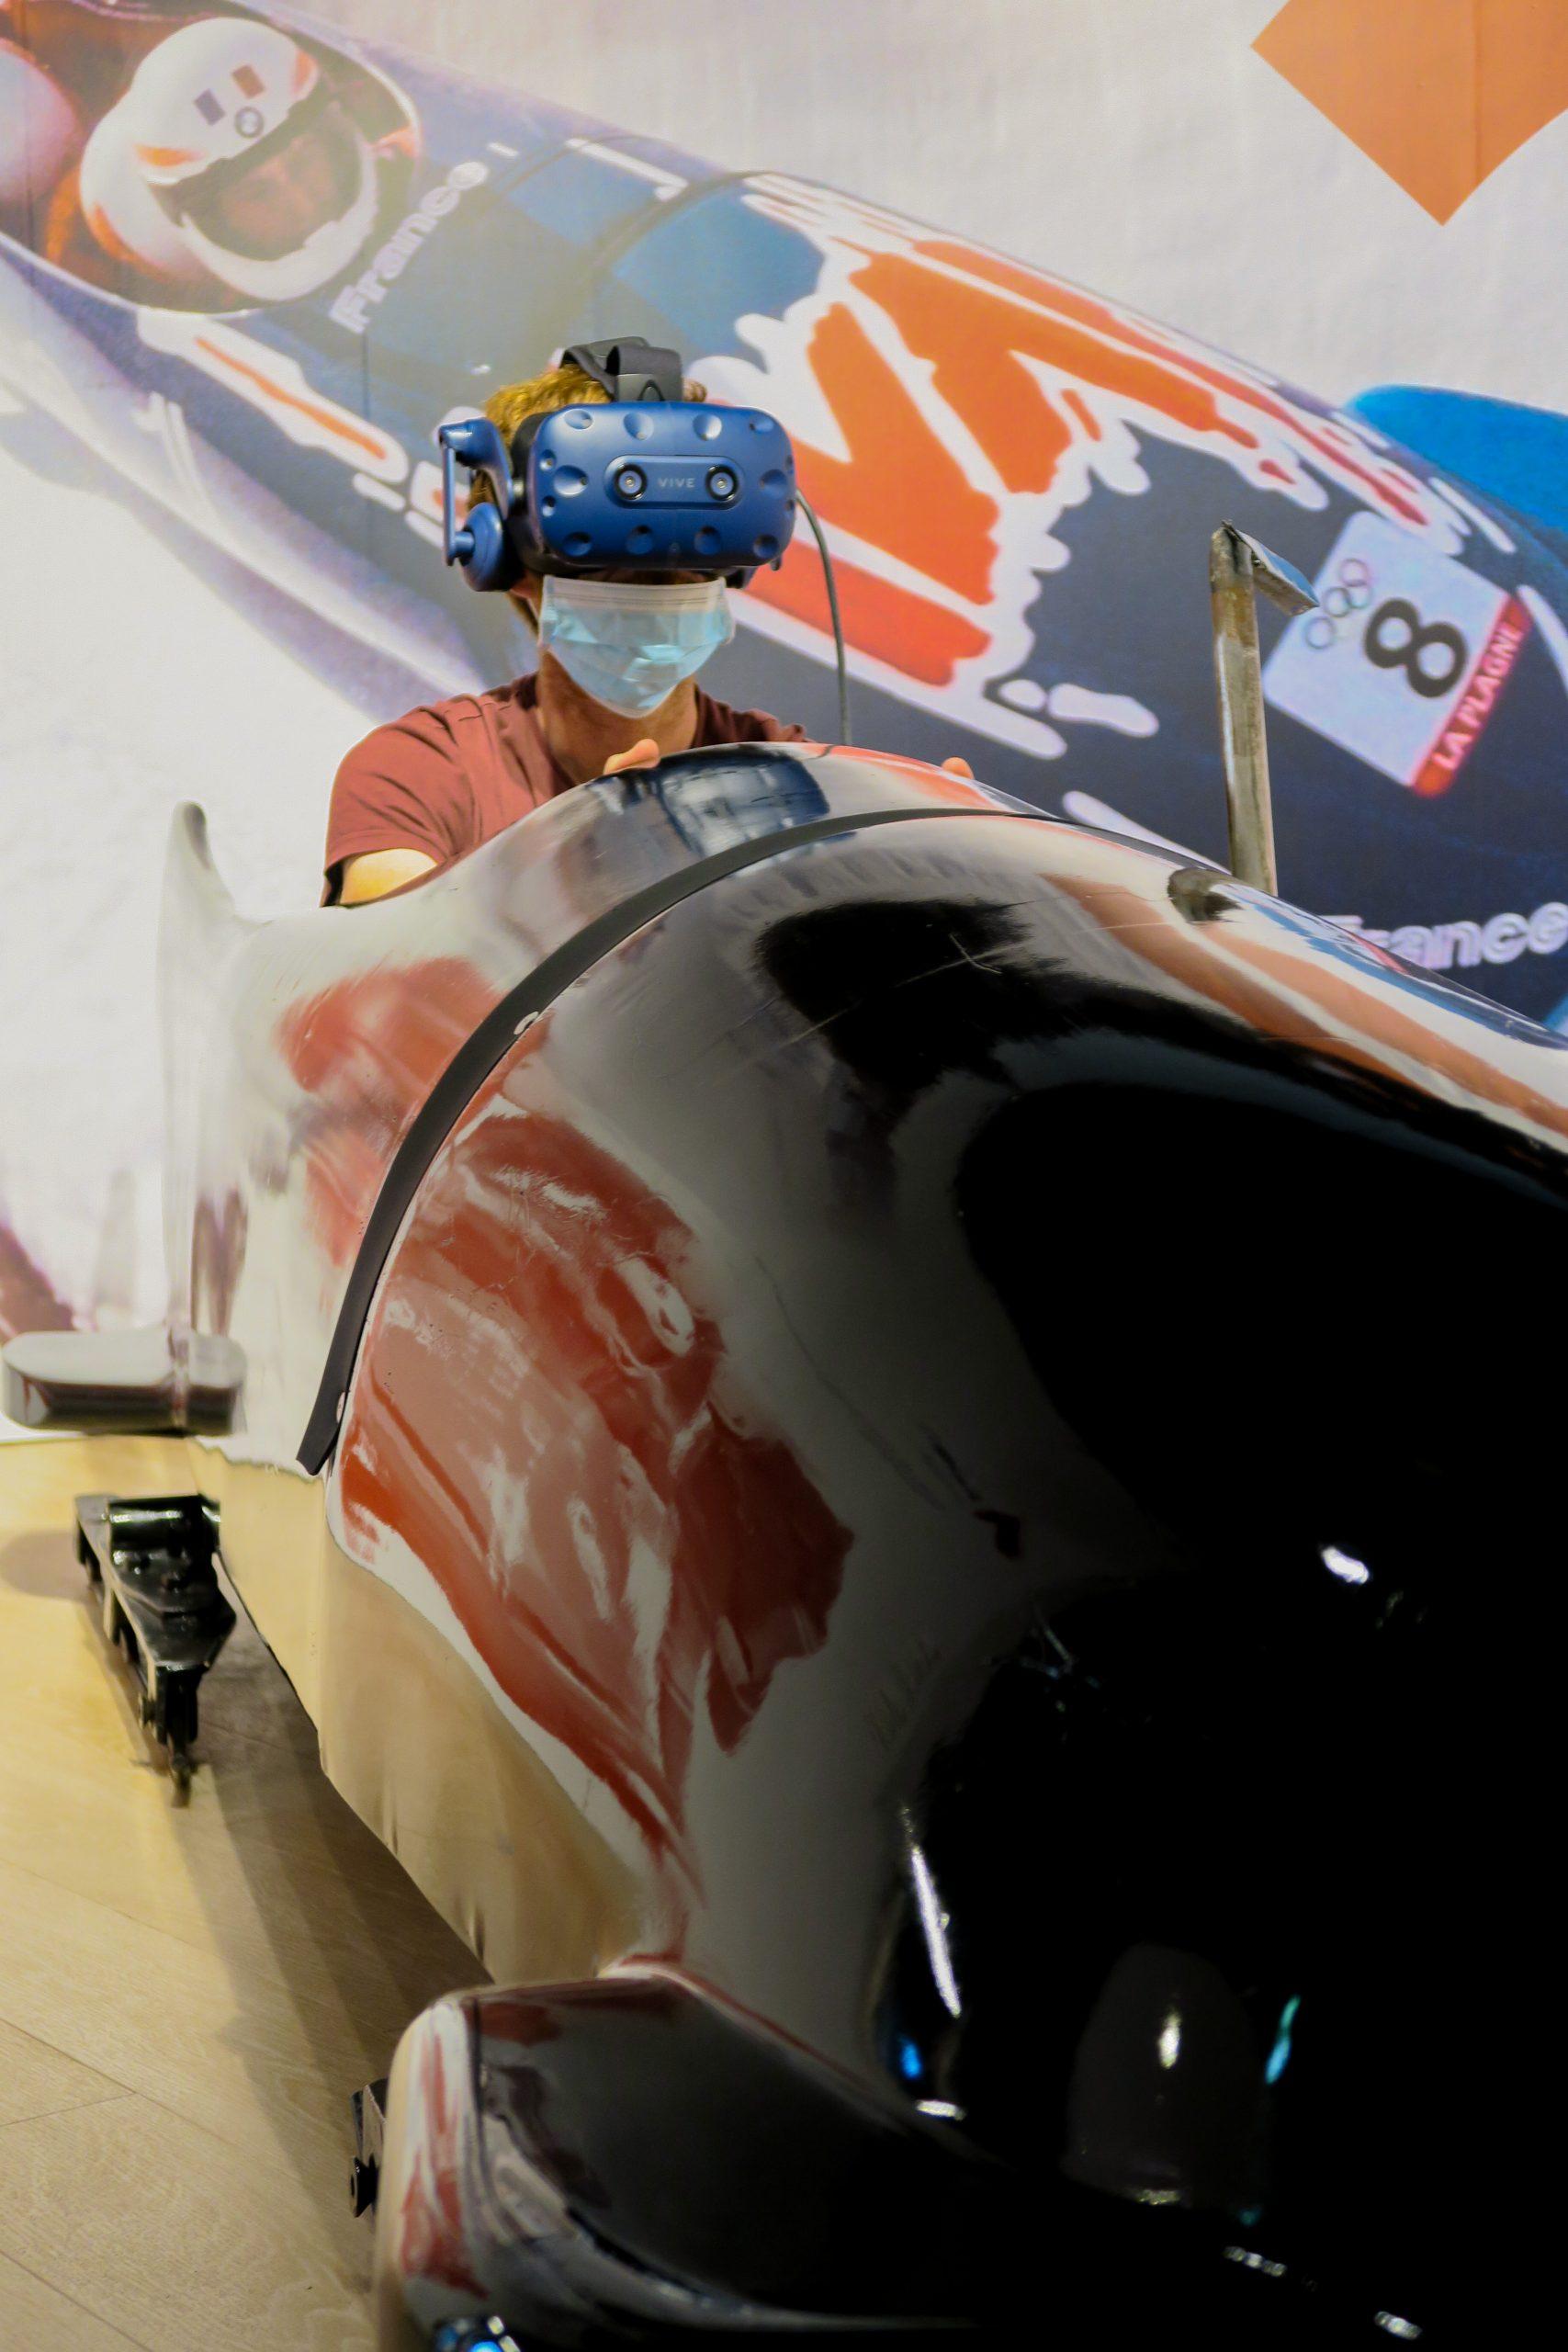 Mathieu qui fait du bobsleigh dans Tremplin 92